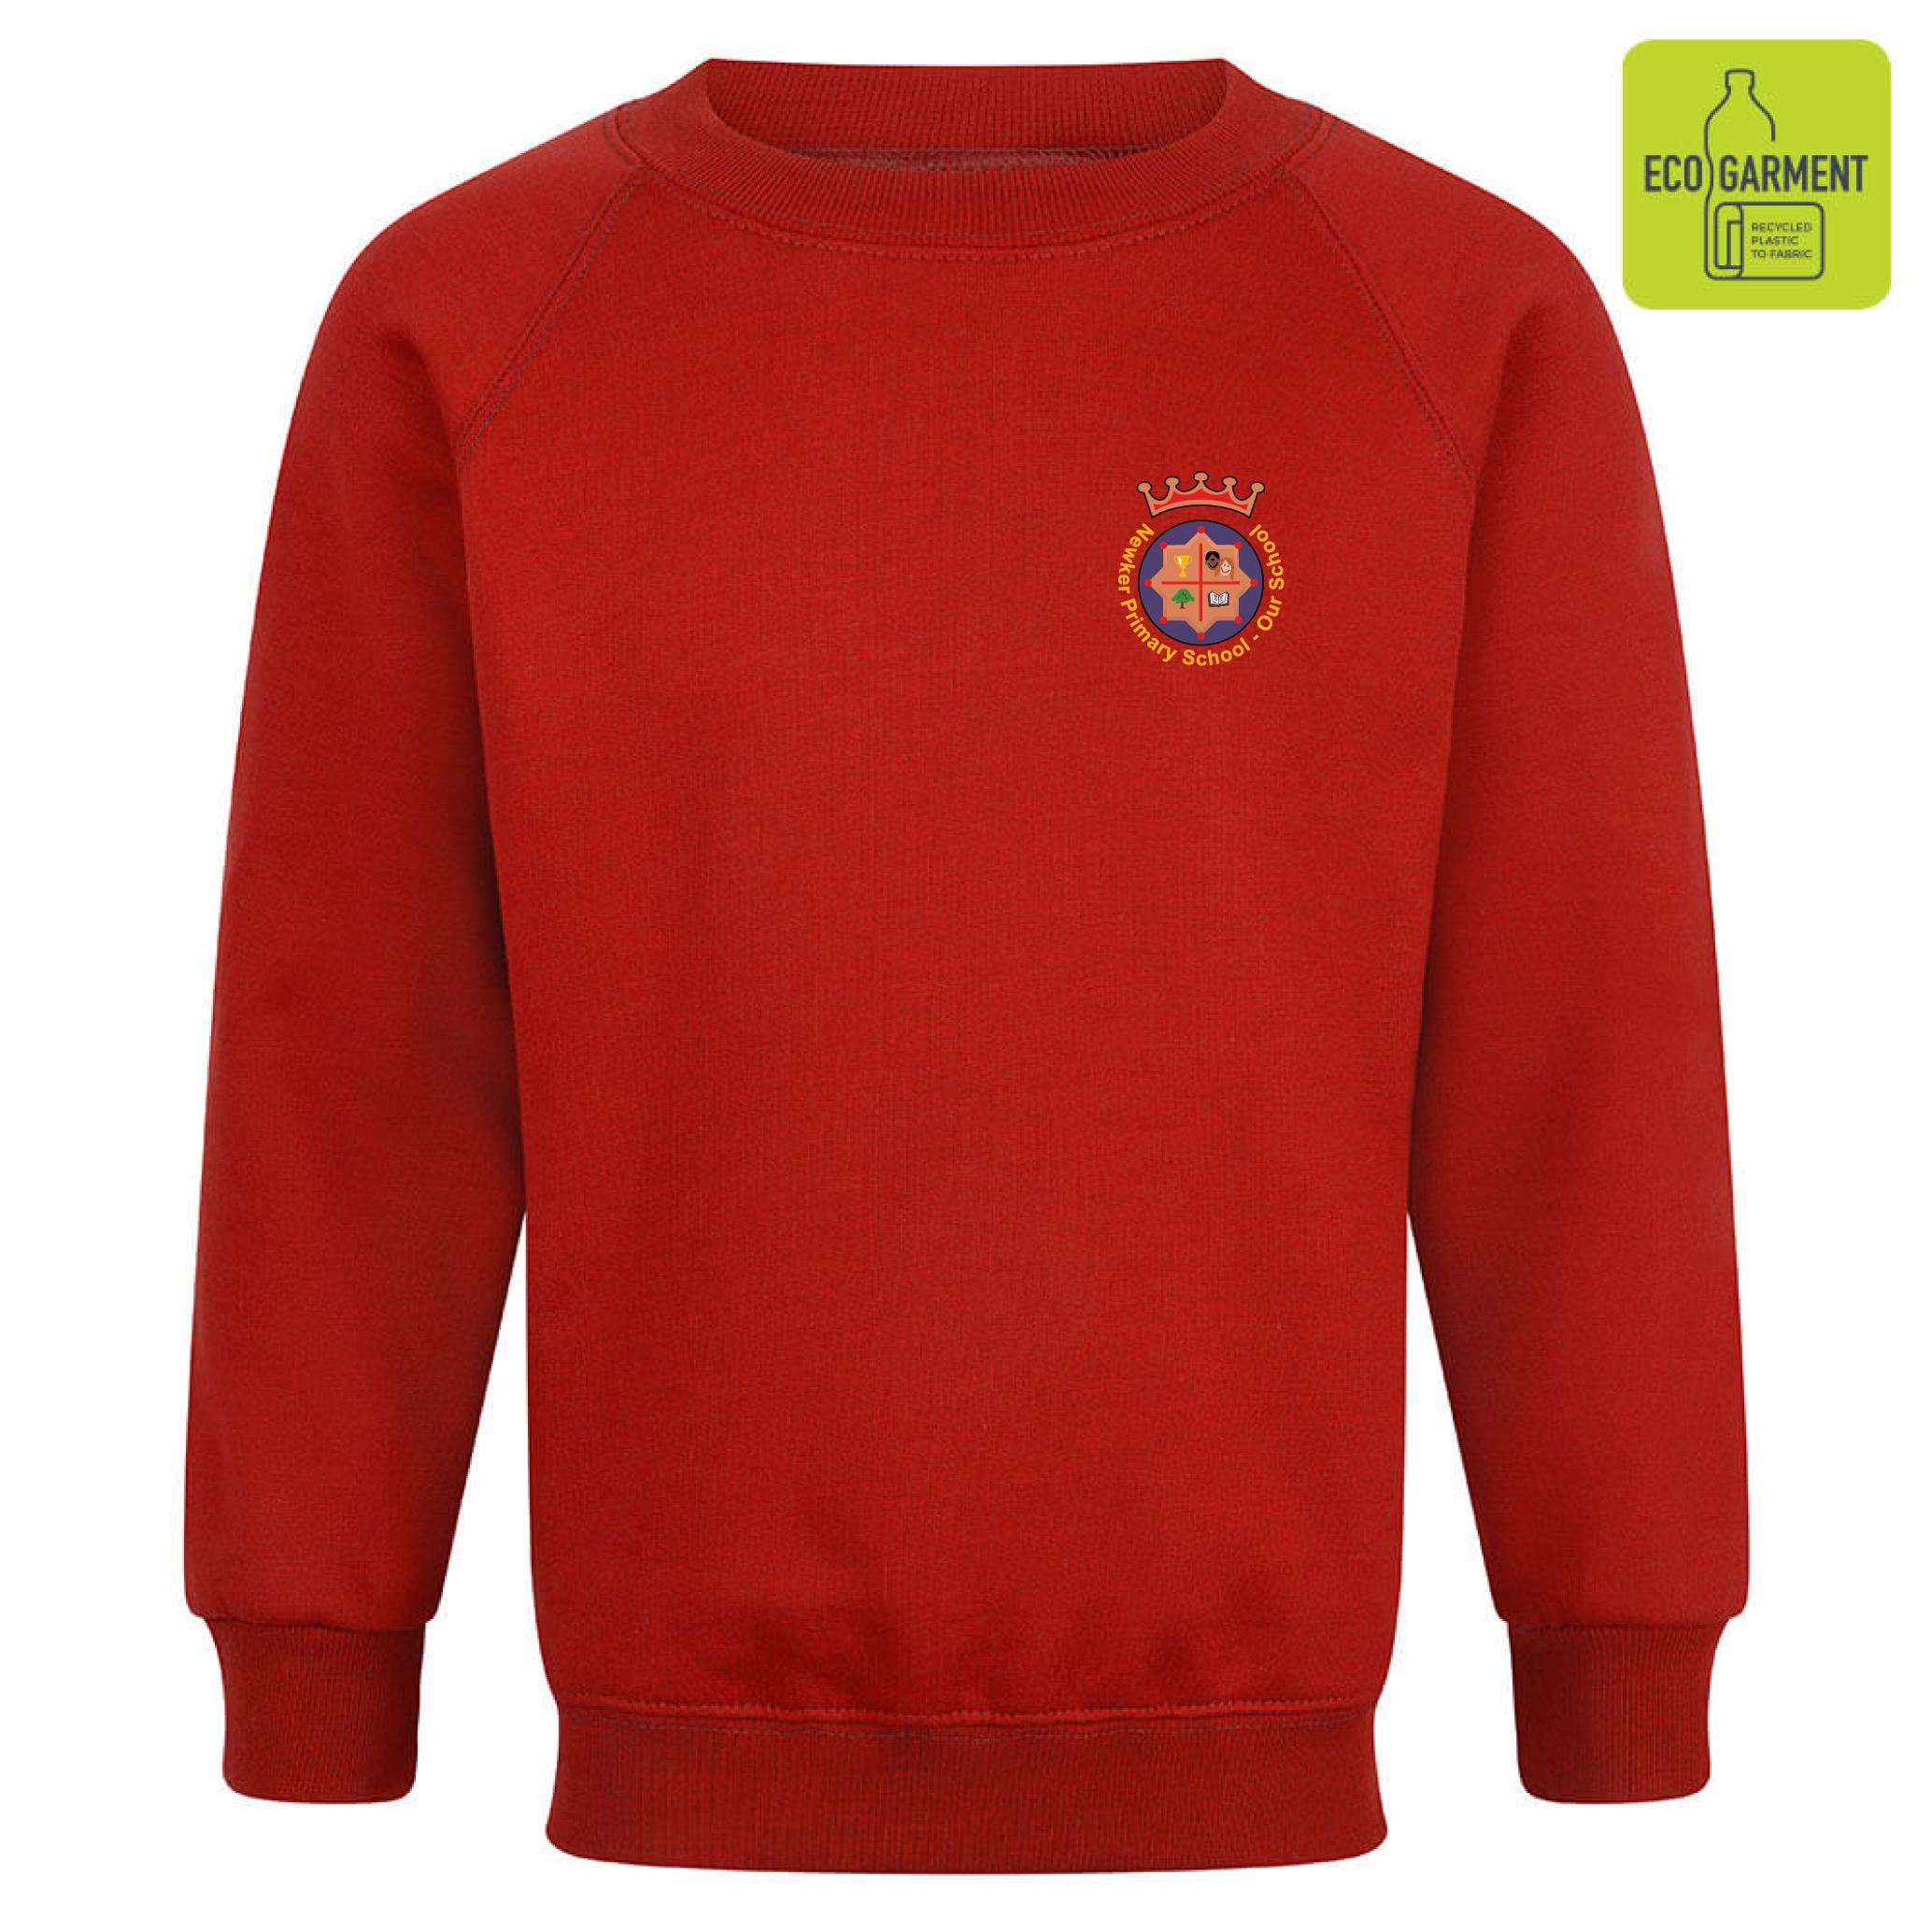 Newker Sweatshirt